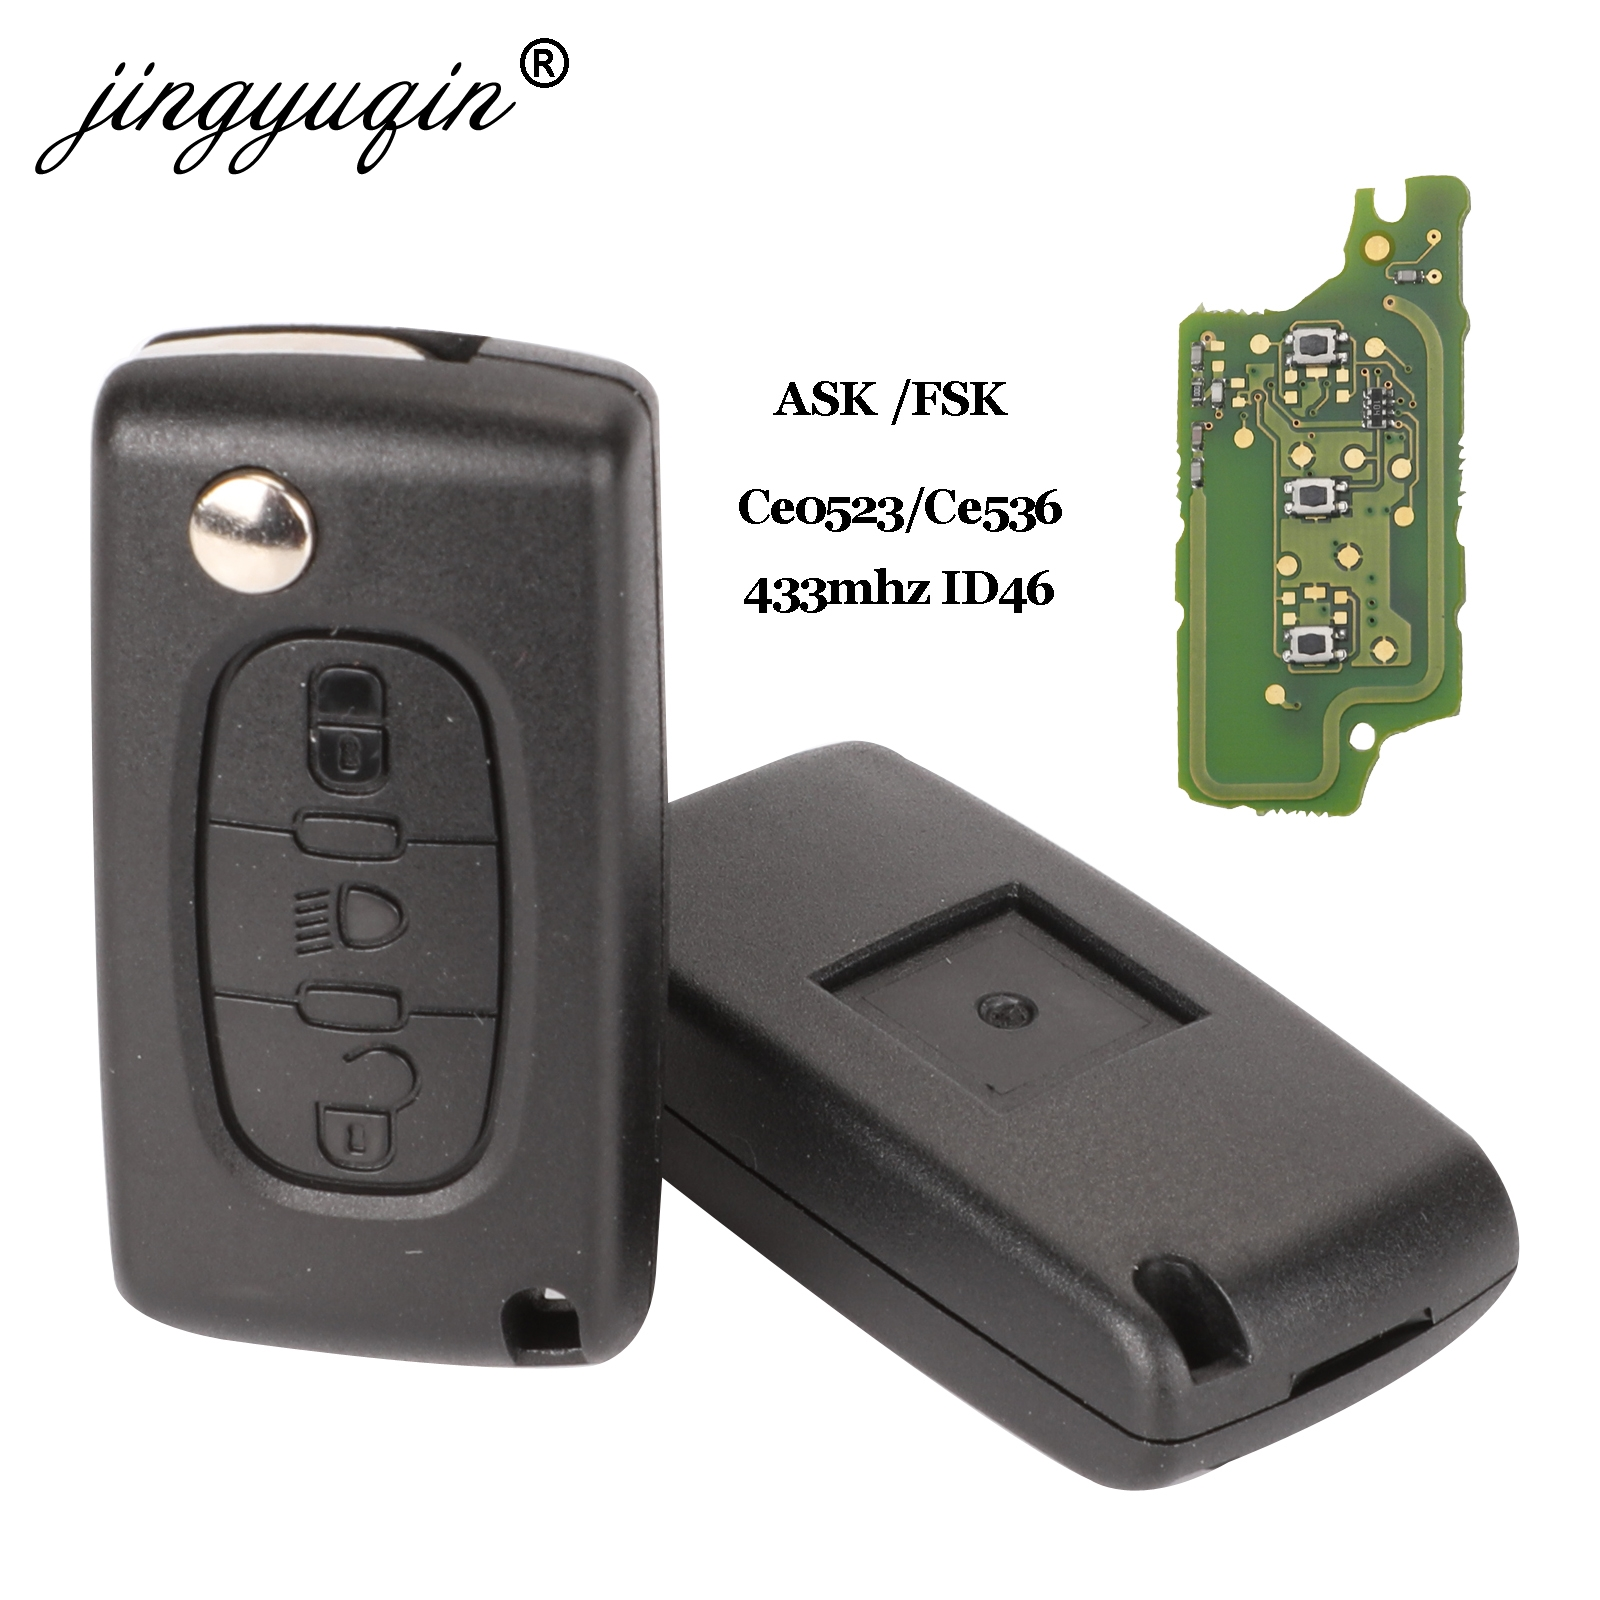 Jingyuqin ASK/FSK 433Mhz ID46 For Citroen C2 C3 C4 C5 C6 C8 3 Buttons Light Flip Remote Car Key Fob VA2/HCA Blade CE0523 Ce0536